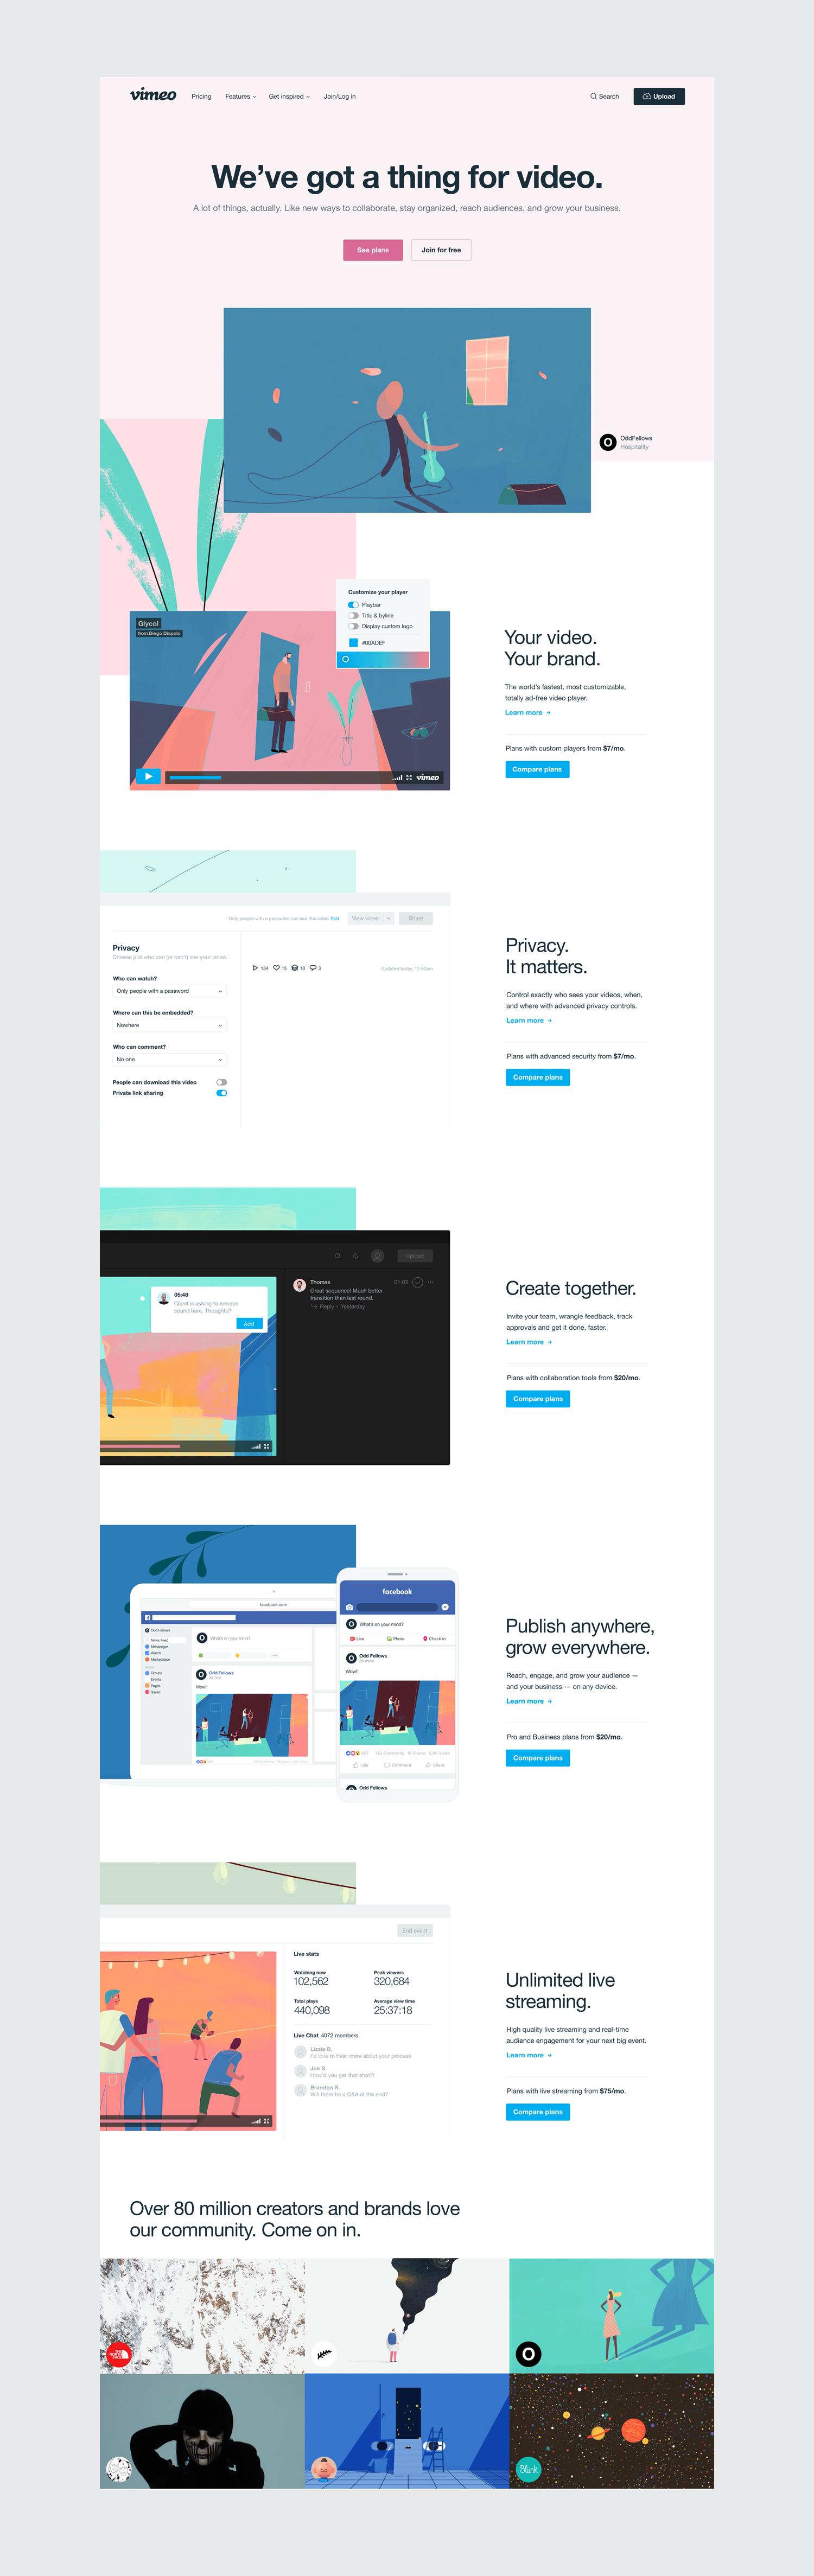 Vimeo_homepage_copy